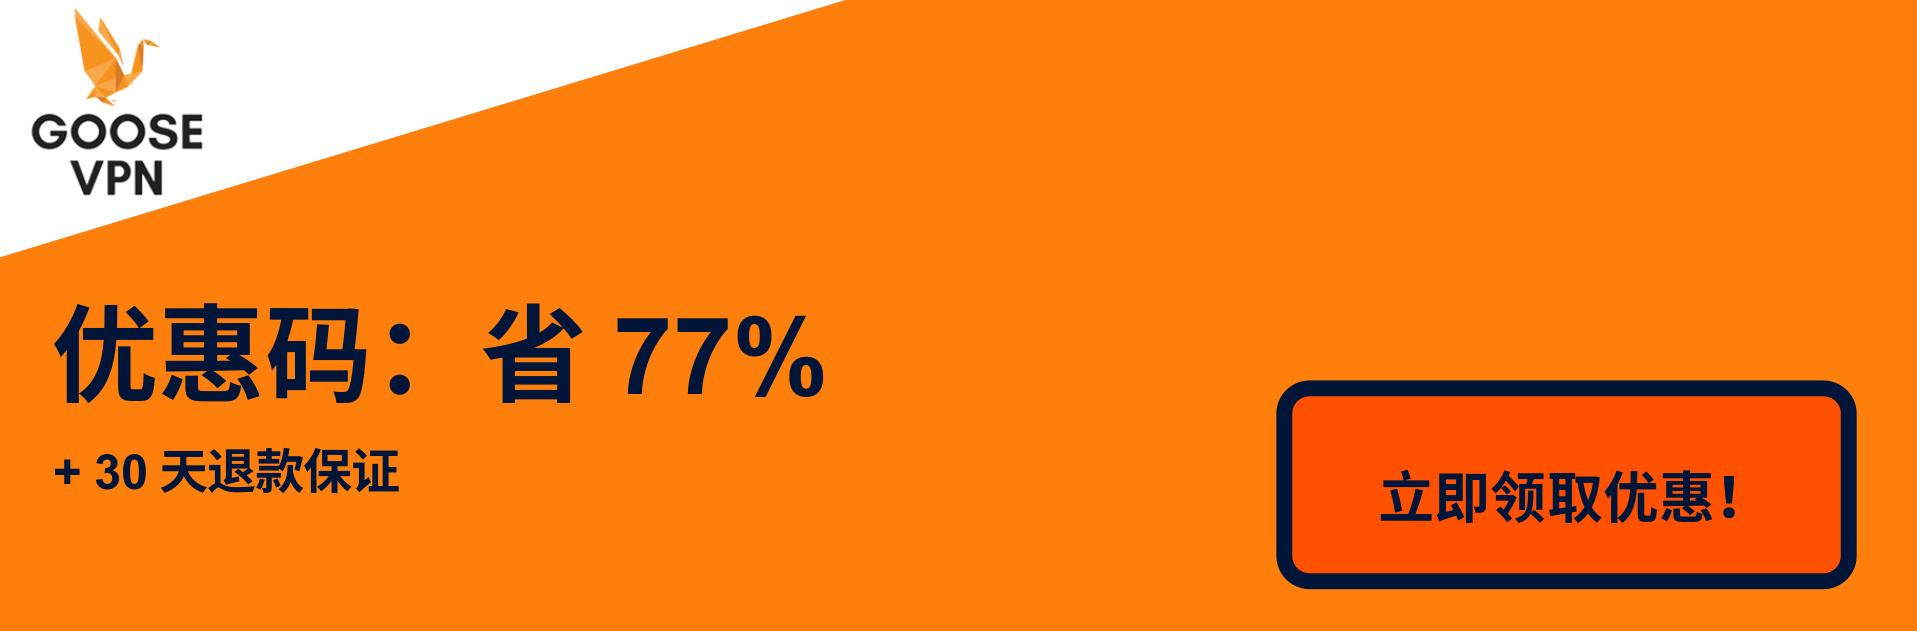 goose vpn coupon banner 77% off